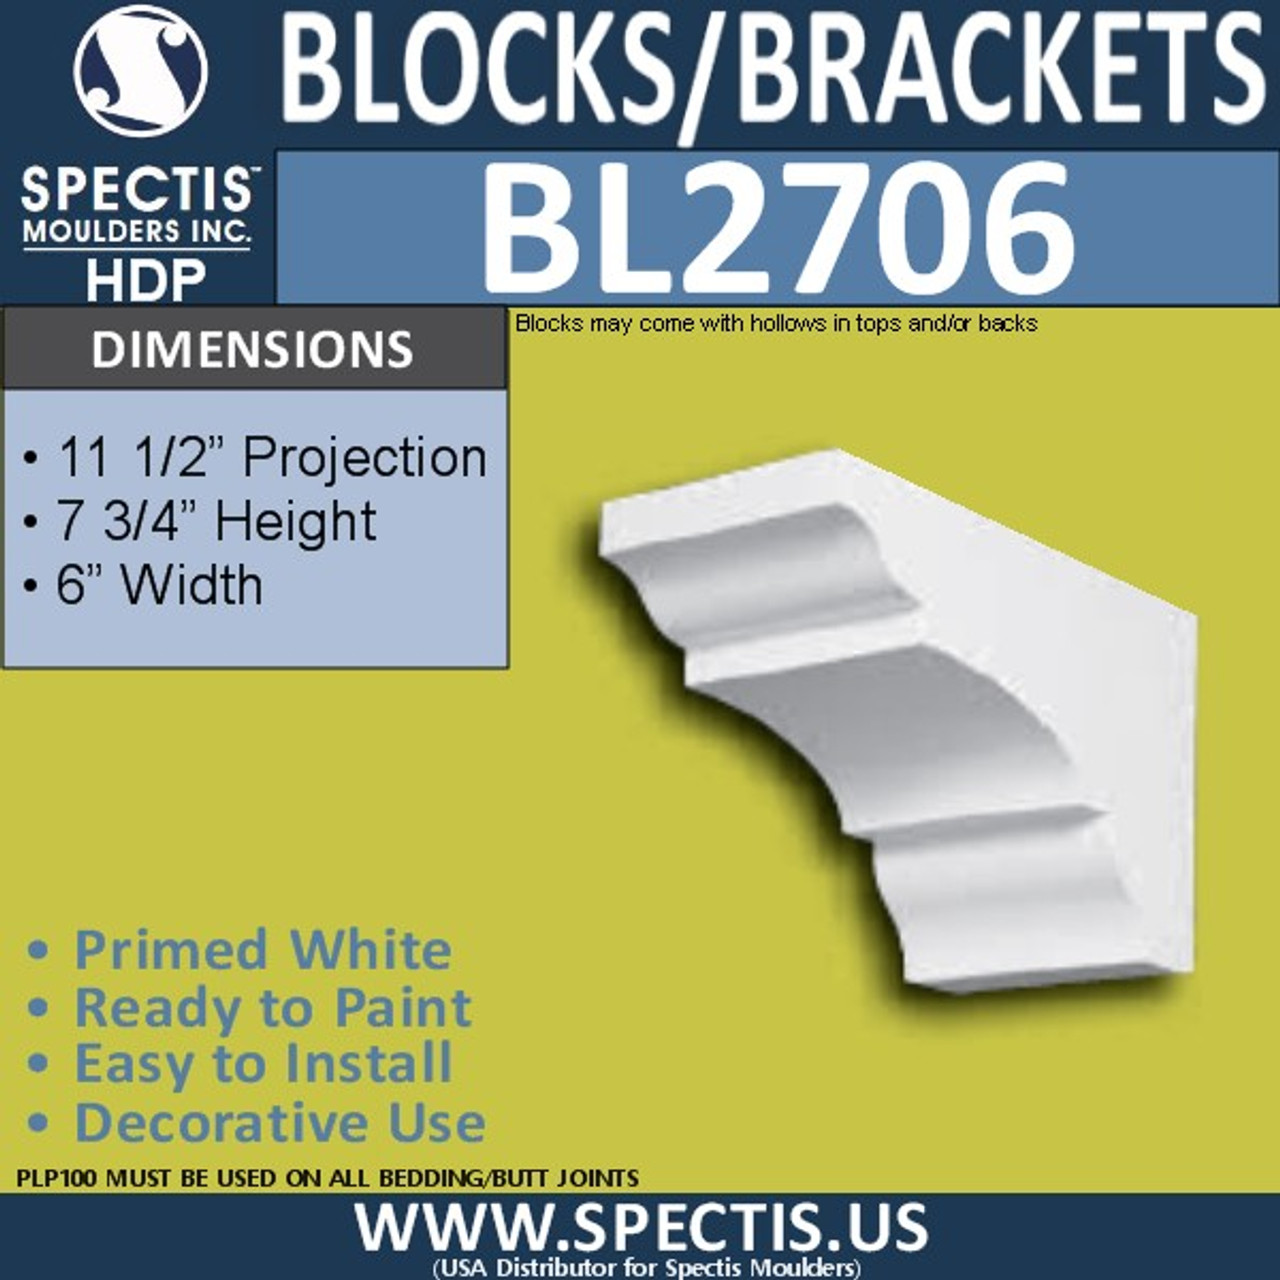 "BL2706 Eave Block or Bracket 6""W x 4""H x 4"" P"